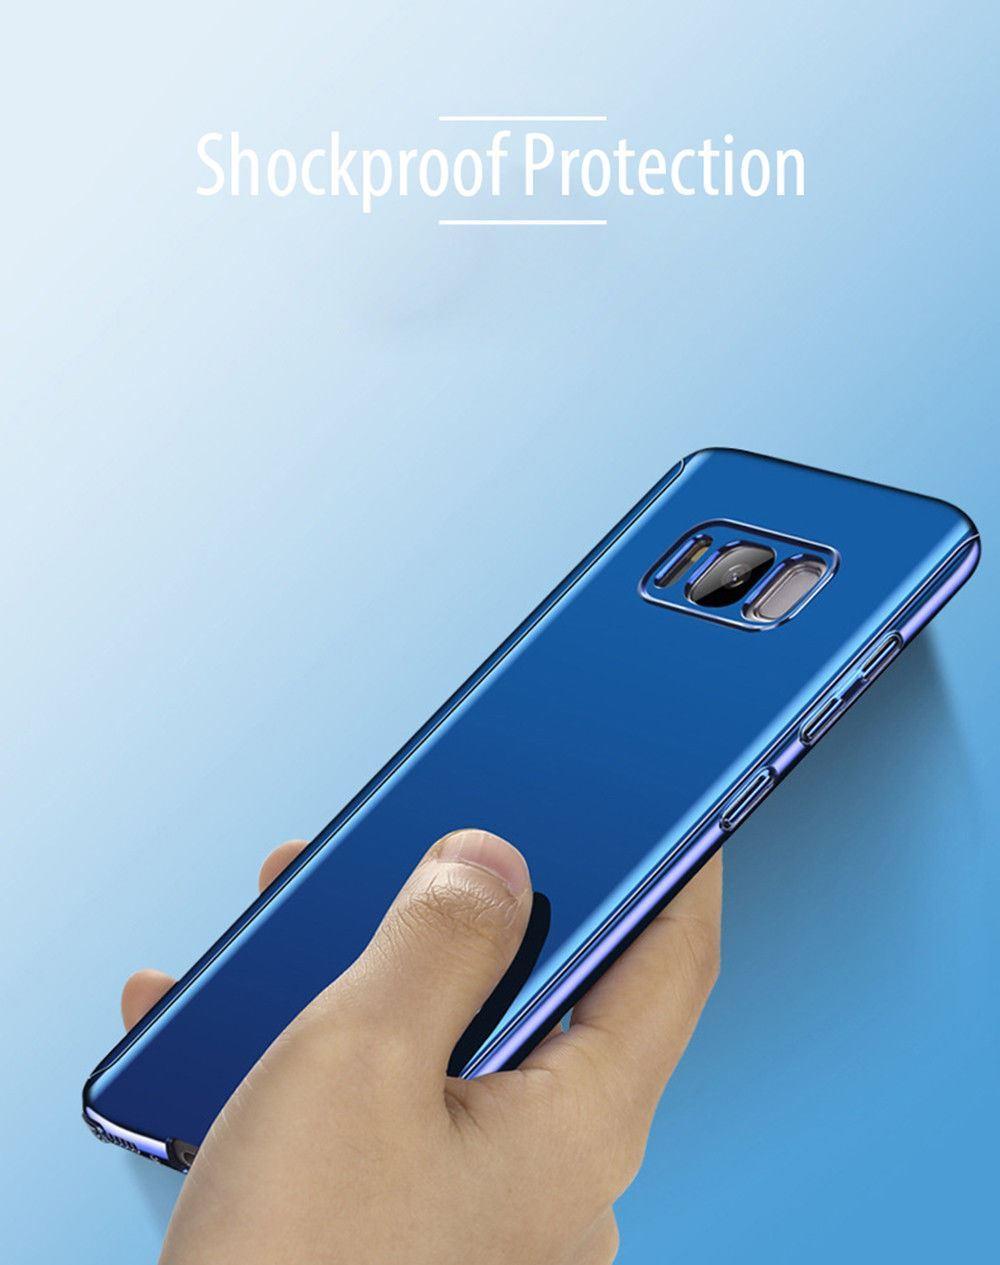 Shockproof-Hybrid-360-Ultra-Thin-Mirror-Hard-Case-Samsung-Galaxy-S7-edge-S8-S9 thumbnail 23